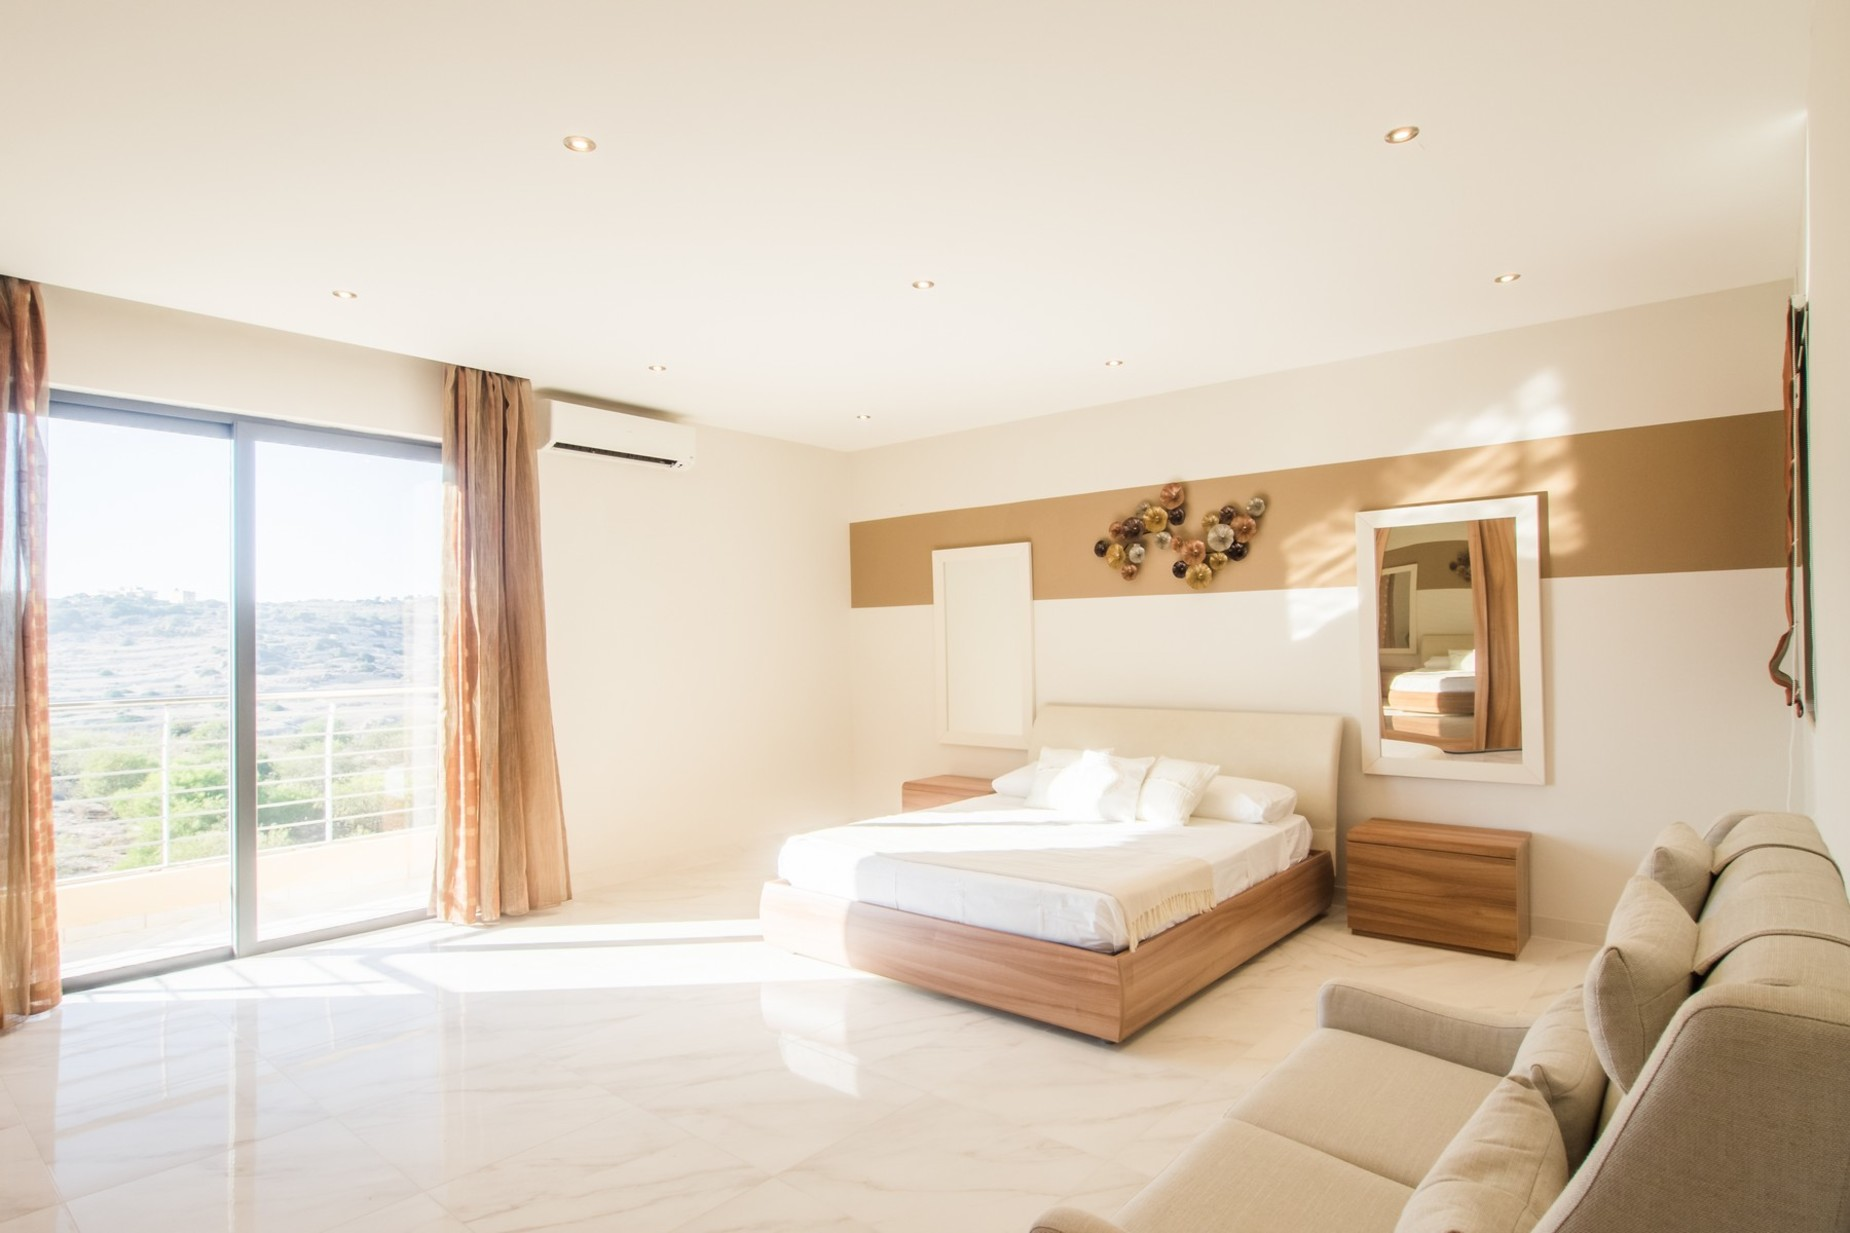 2 bed Apartment For Rent in Xemxija, Xemxija - thumb 12